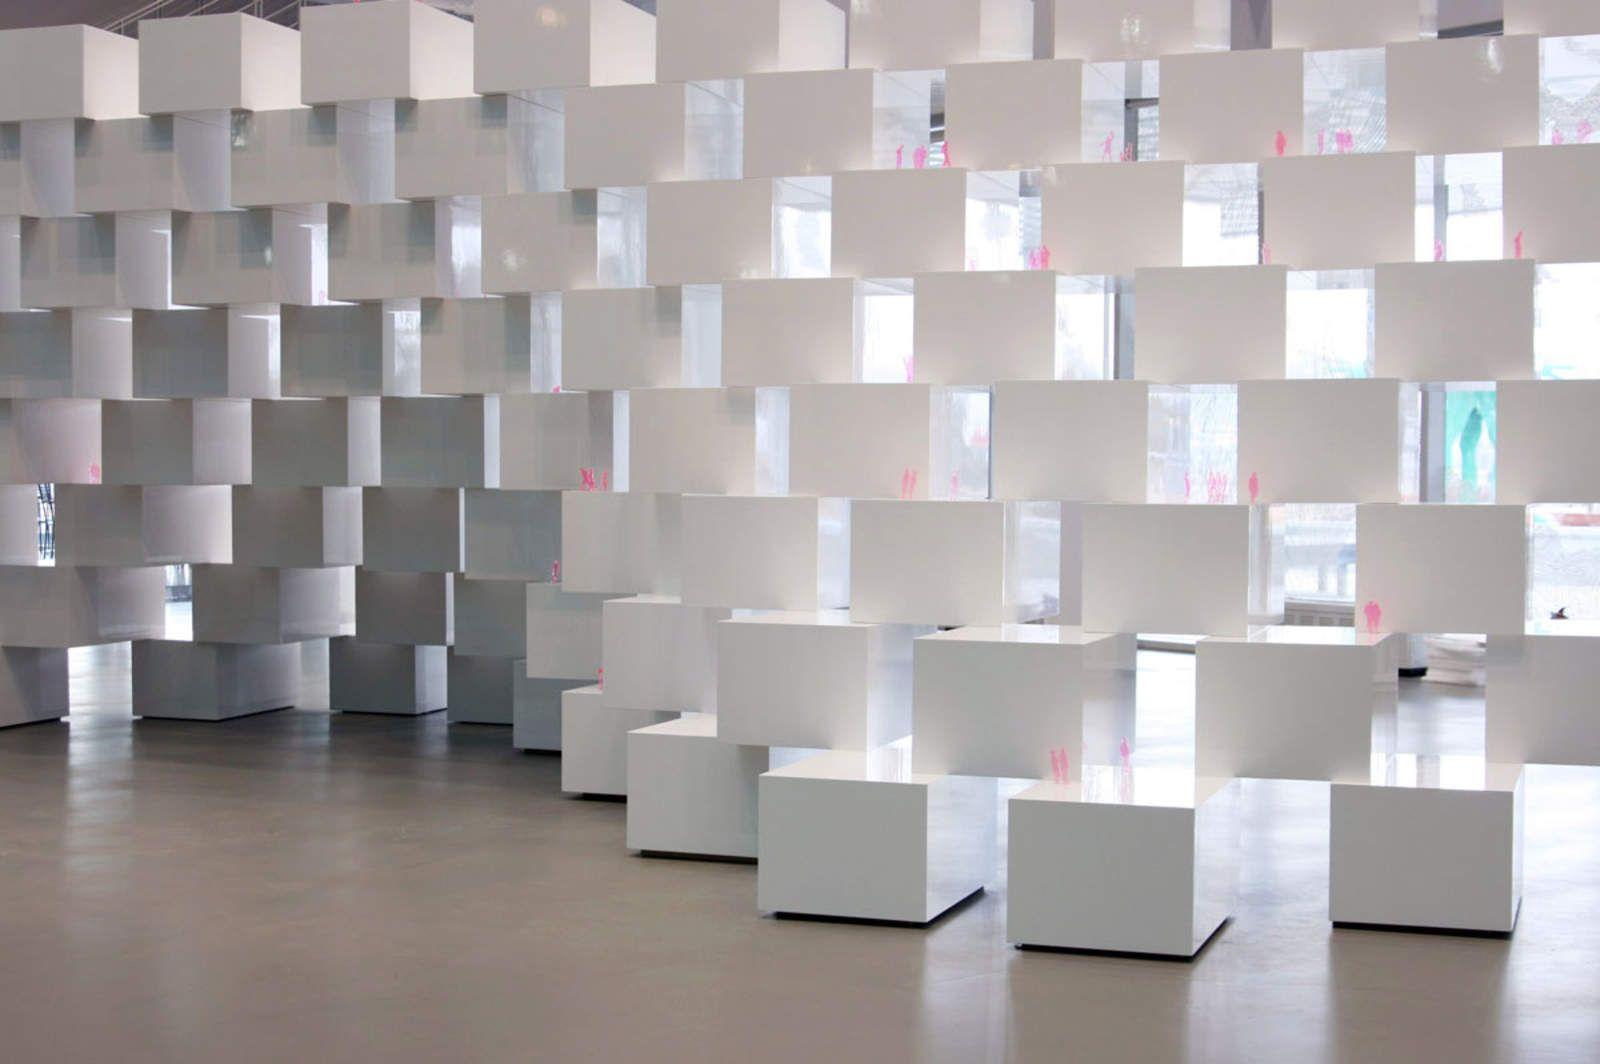 Big bjarke ingels group exhibition design